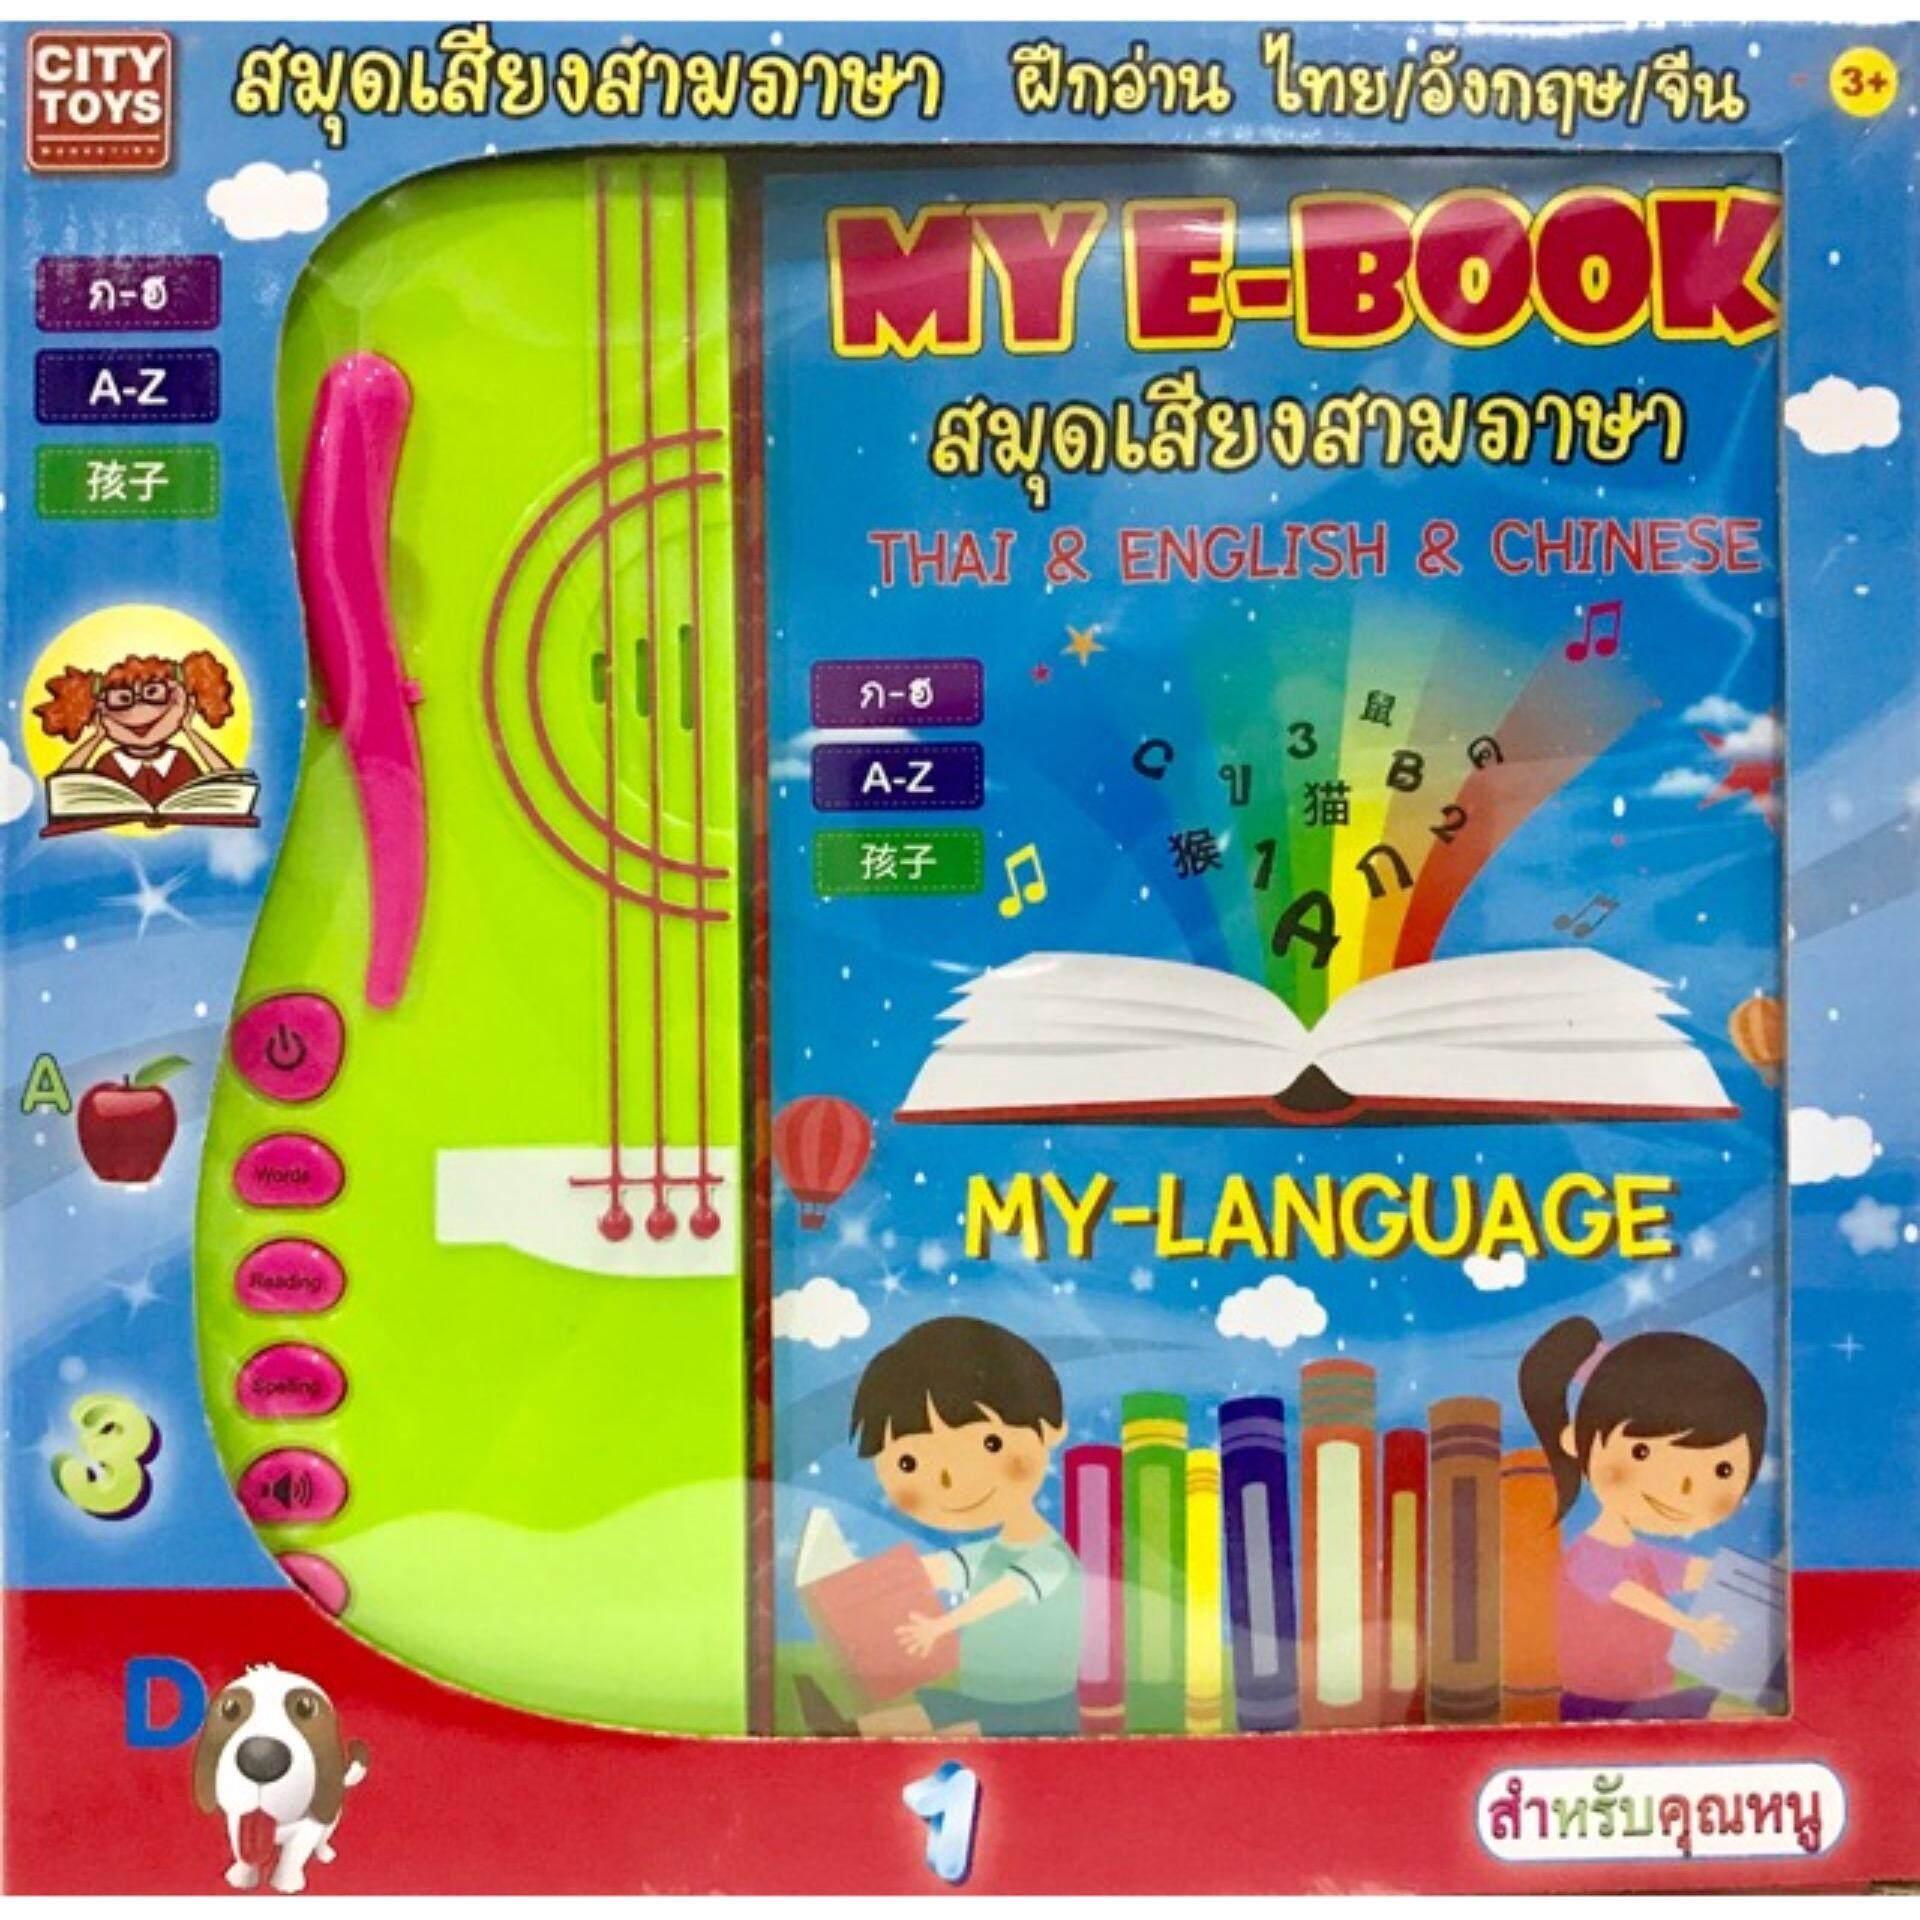 My E-Book สมุดเสียงสามภาษา ฝึกอ่าน ไทย/อังกฤษ/จีน By Hans.